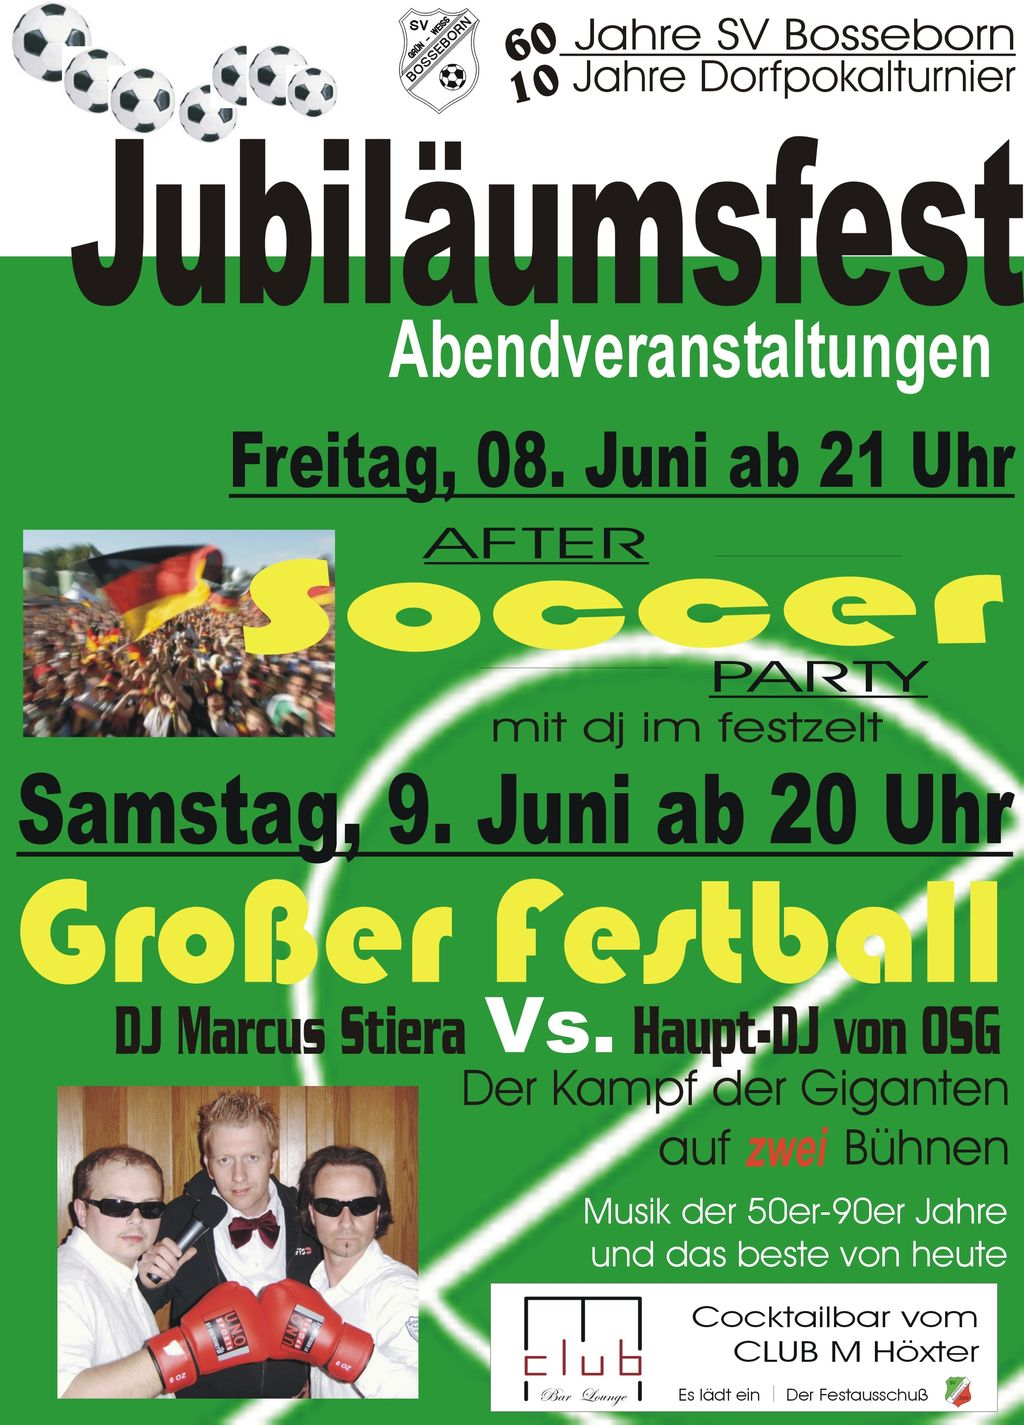 Bosseborn Jubiläumsfest II